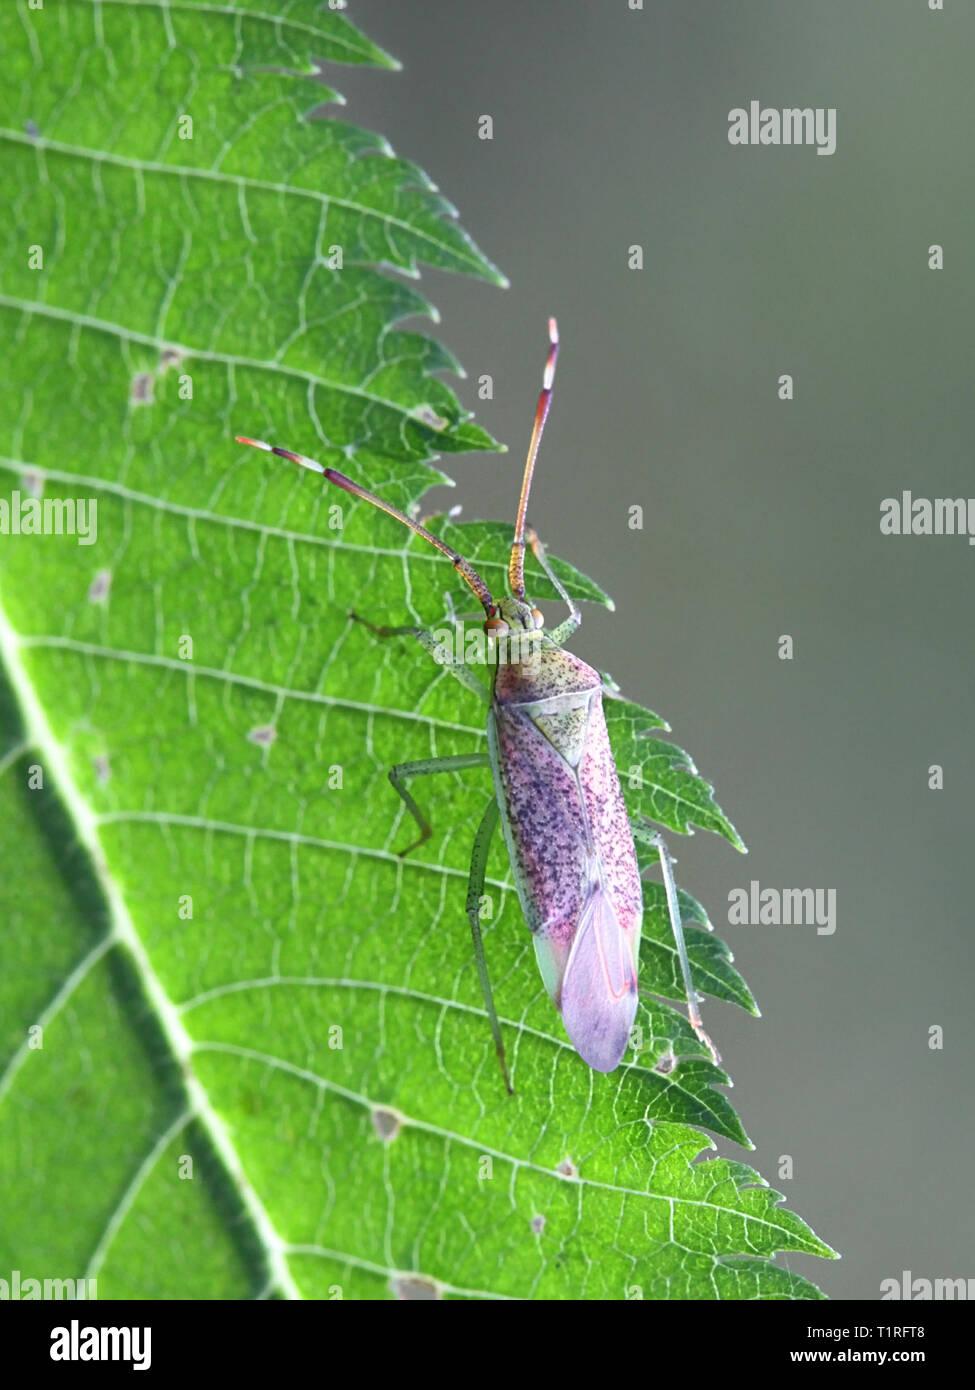 Capsid or mirid bug, Pantilius tunicatus - Stock Image